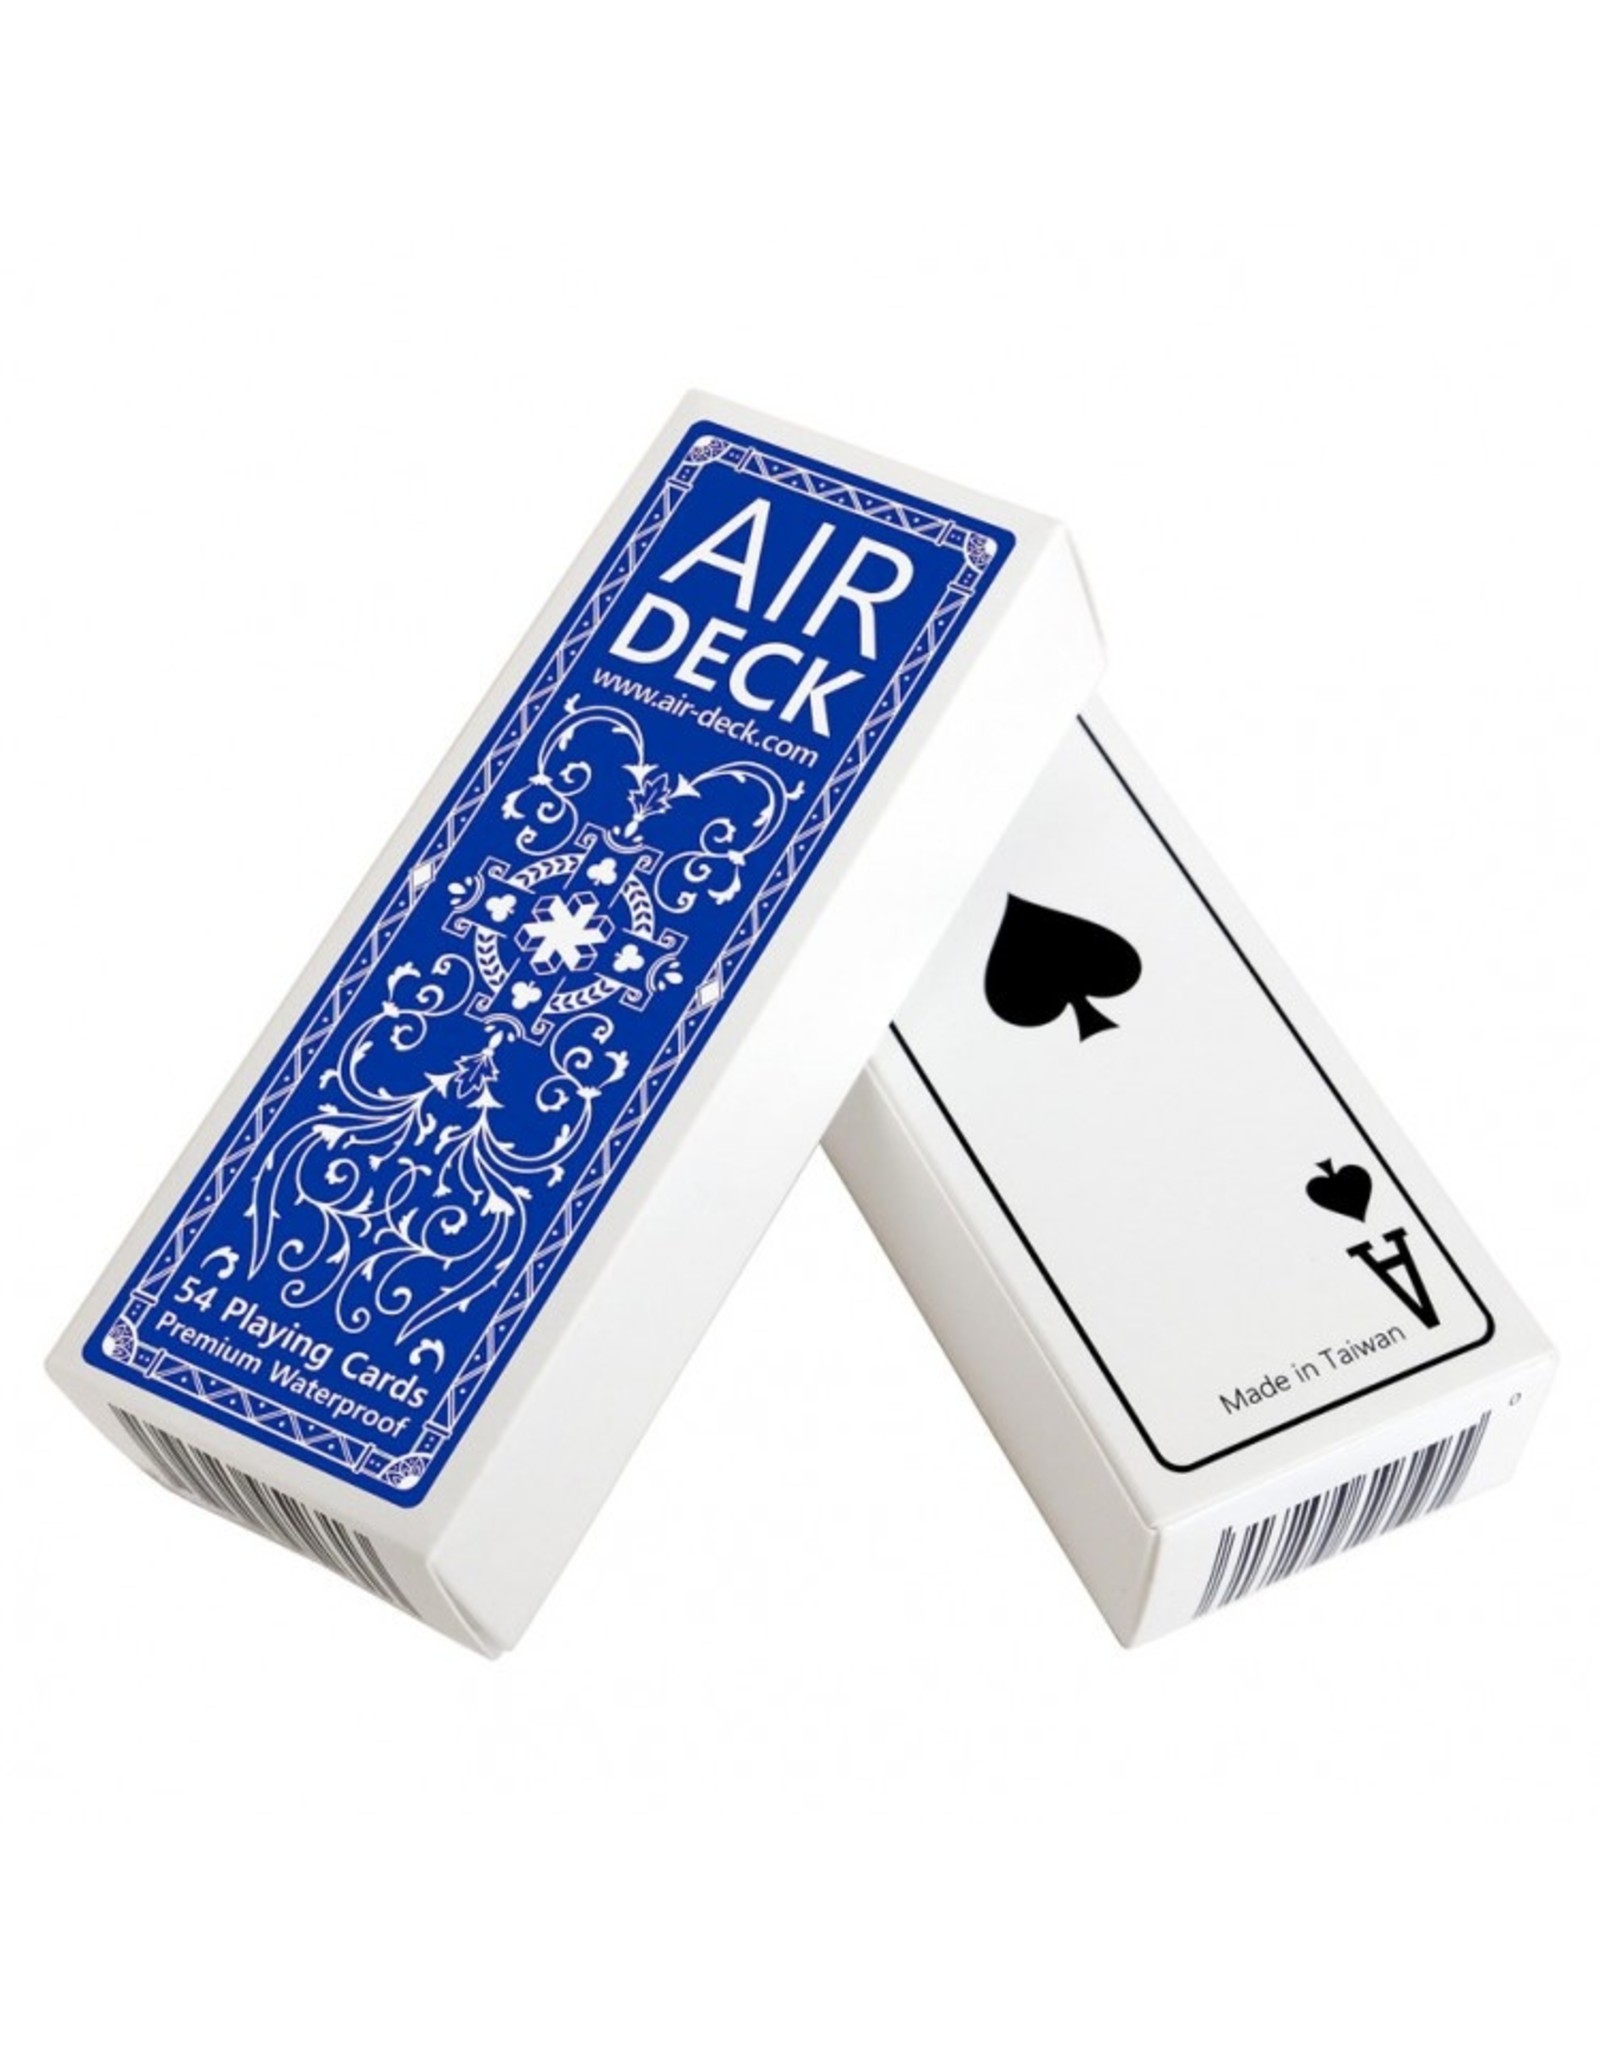 Tiptop Things Air Deck: Classic BU